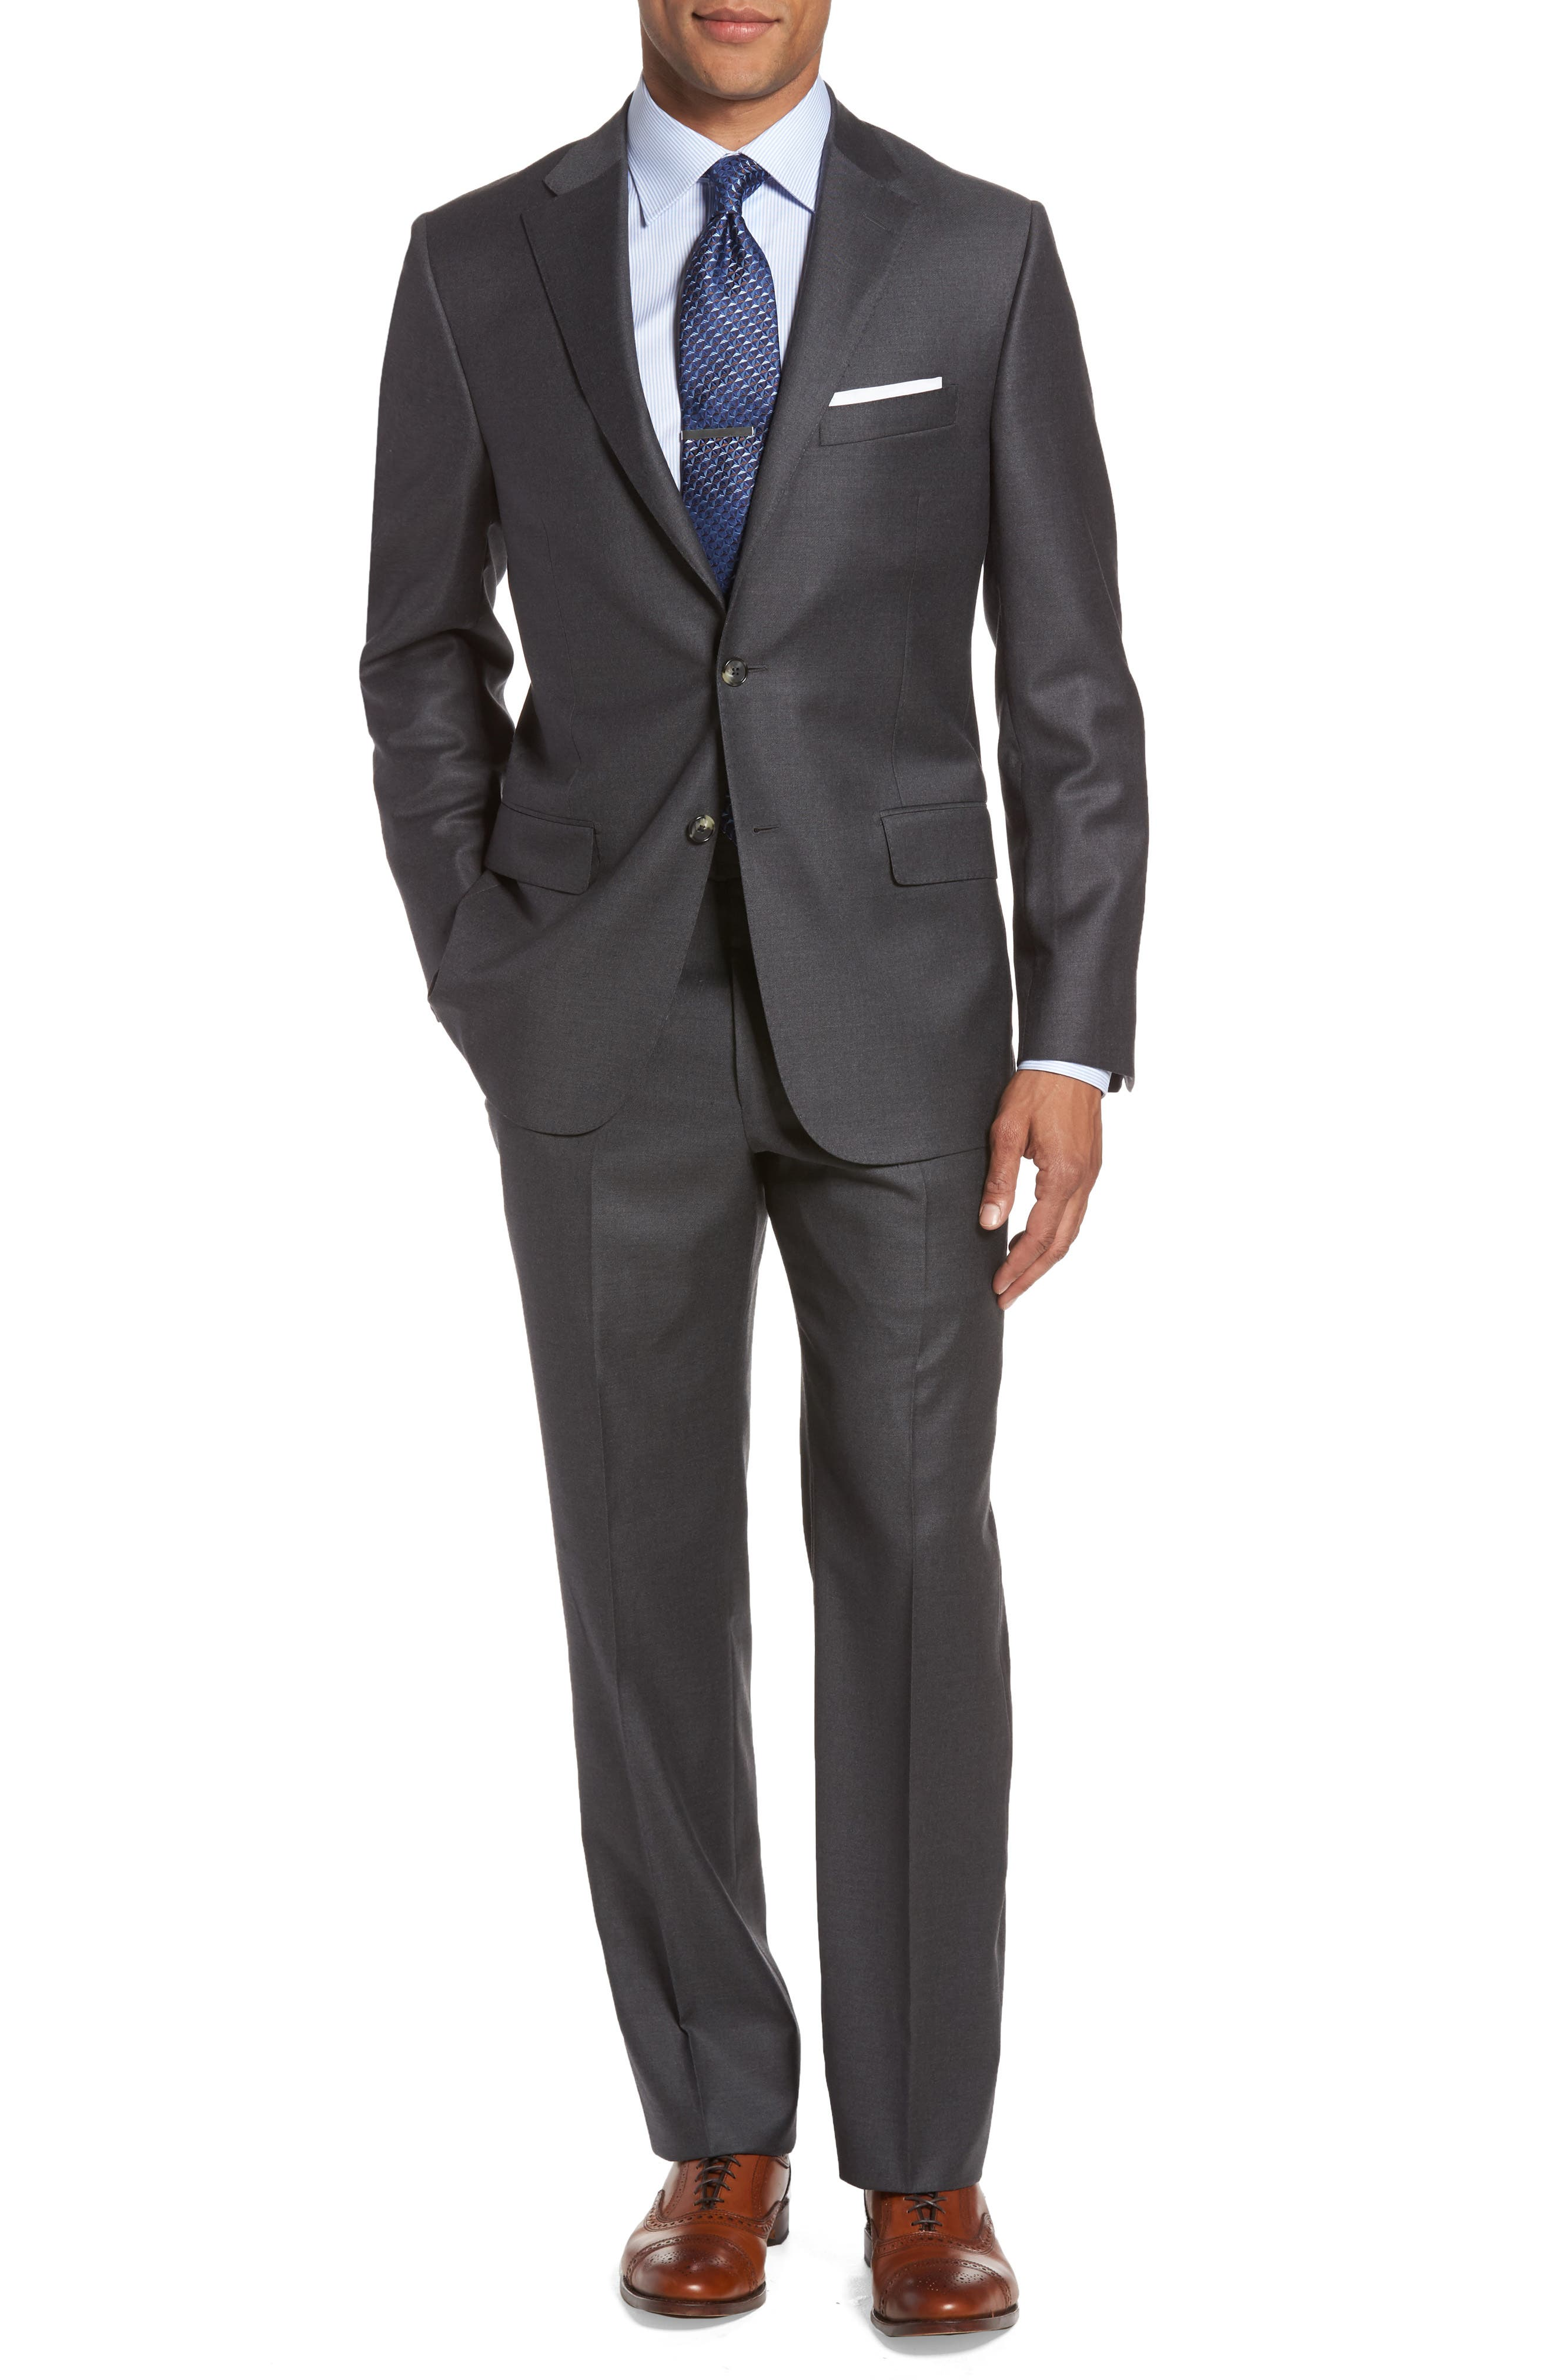 Main Image - Hickey Freeman Classic B Fit Loro Piana Wool Suit